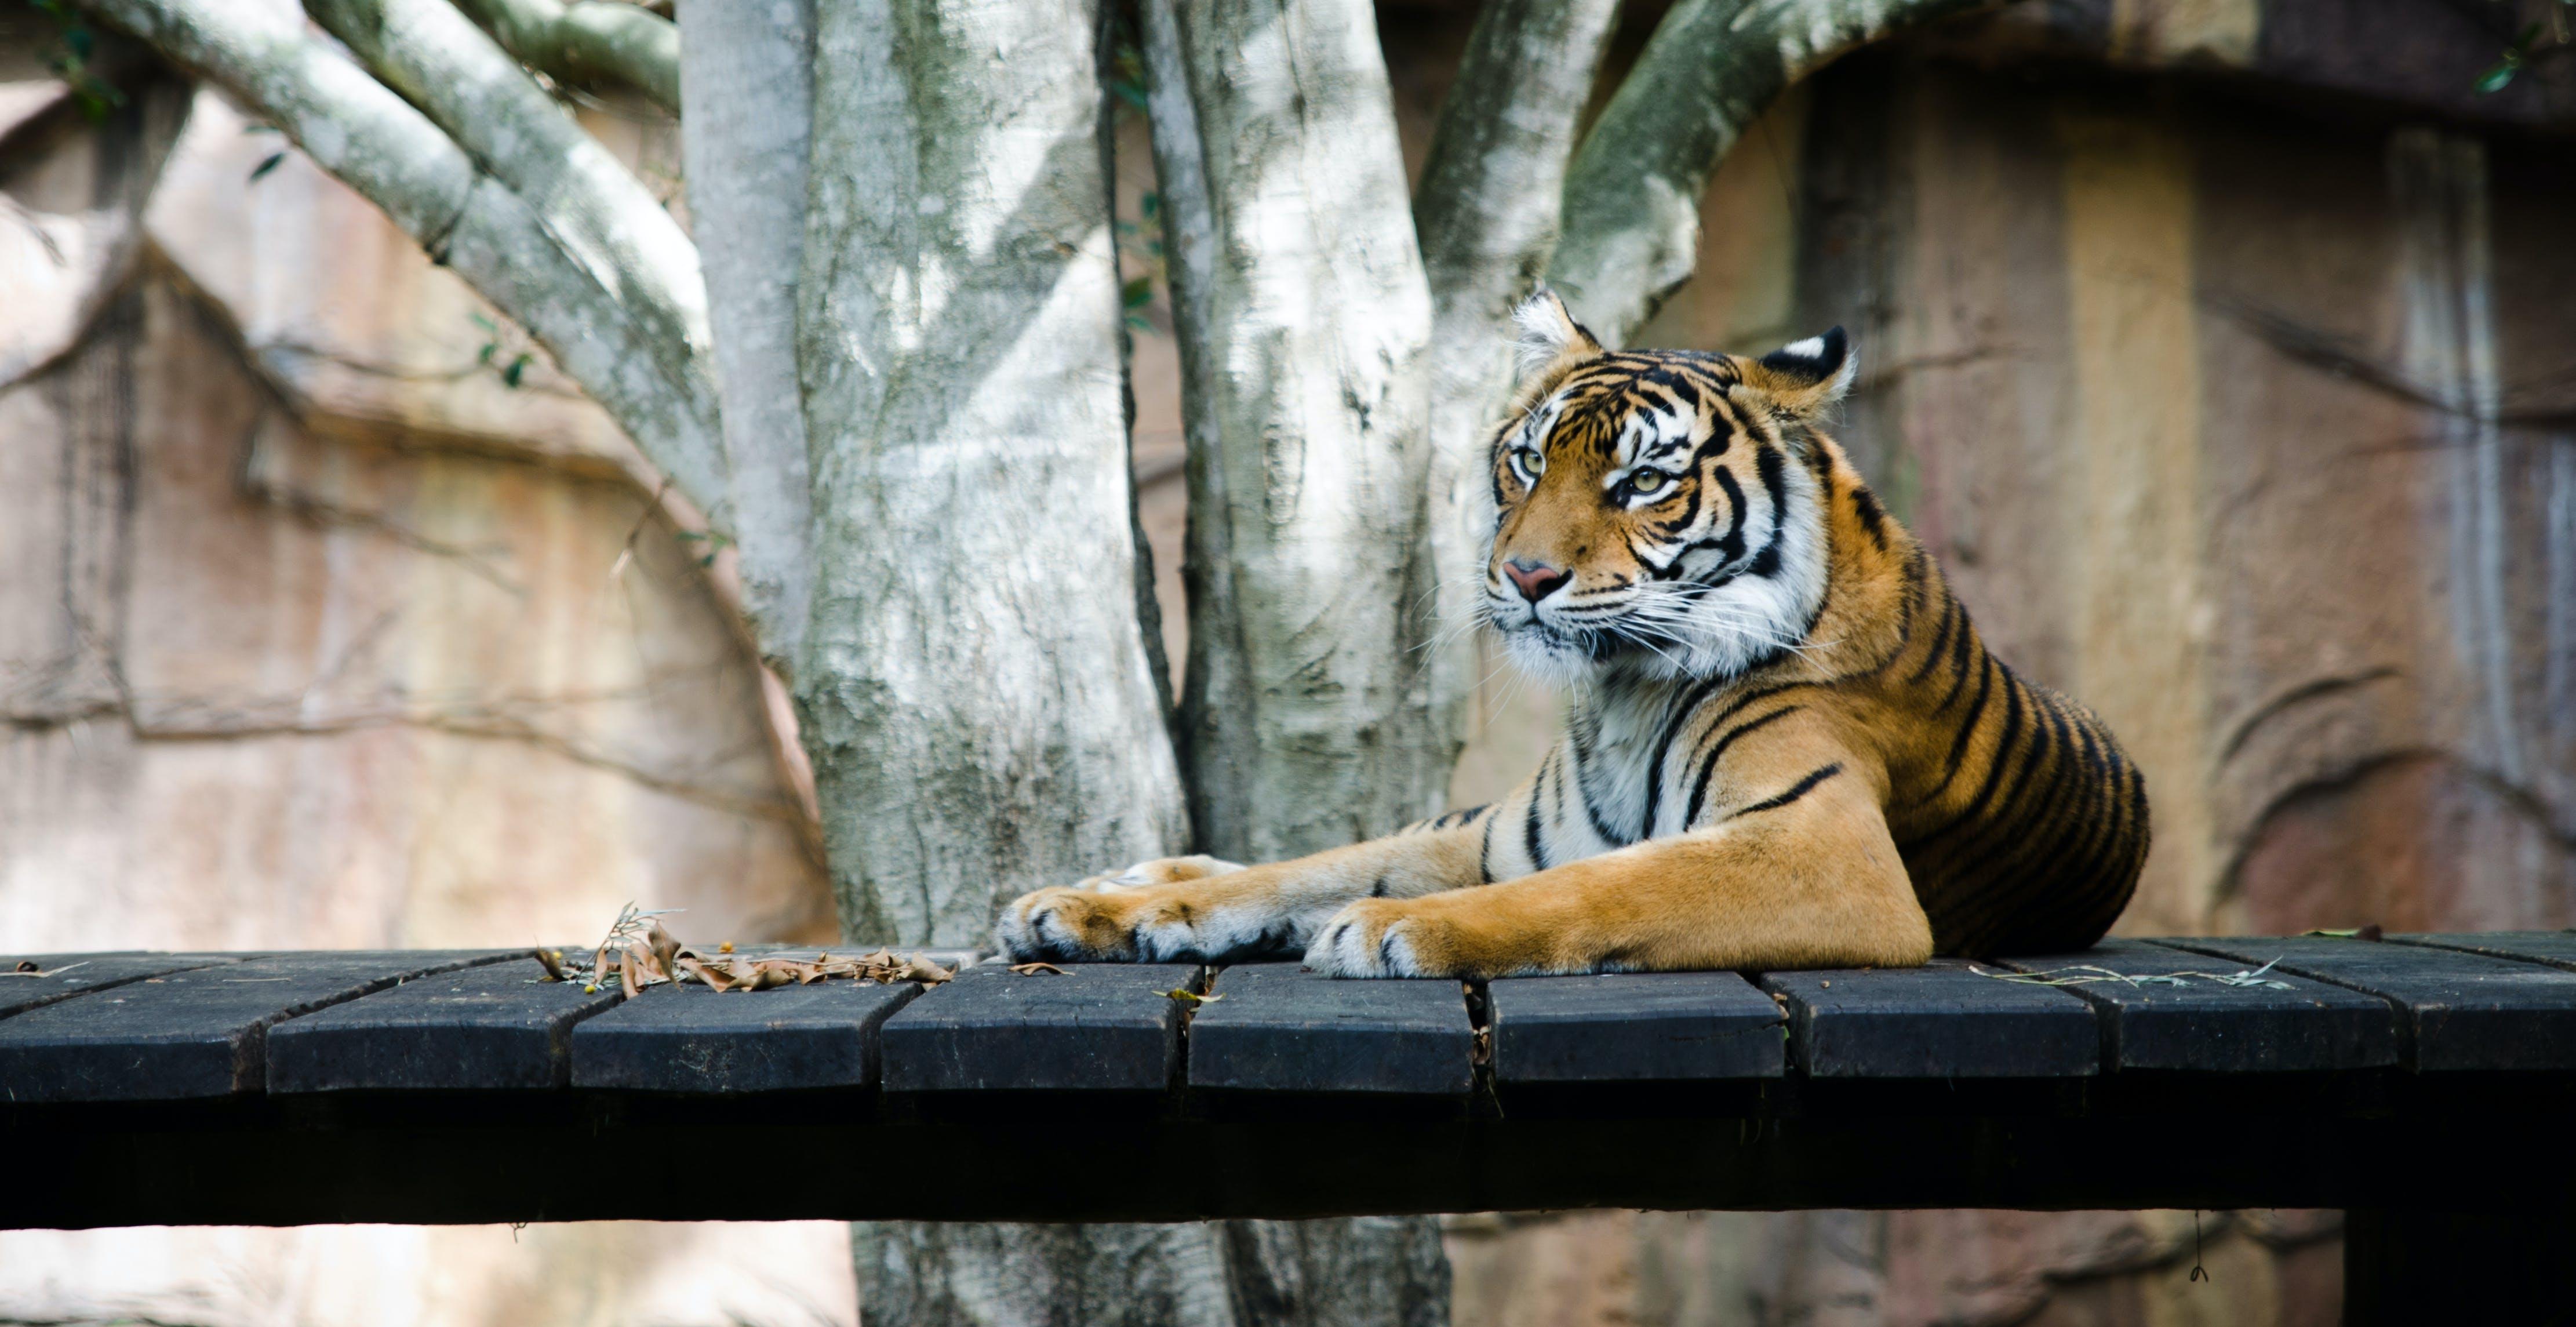 Orange Tiger Lying on Bridge